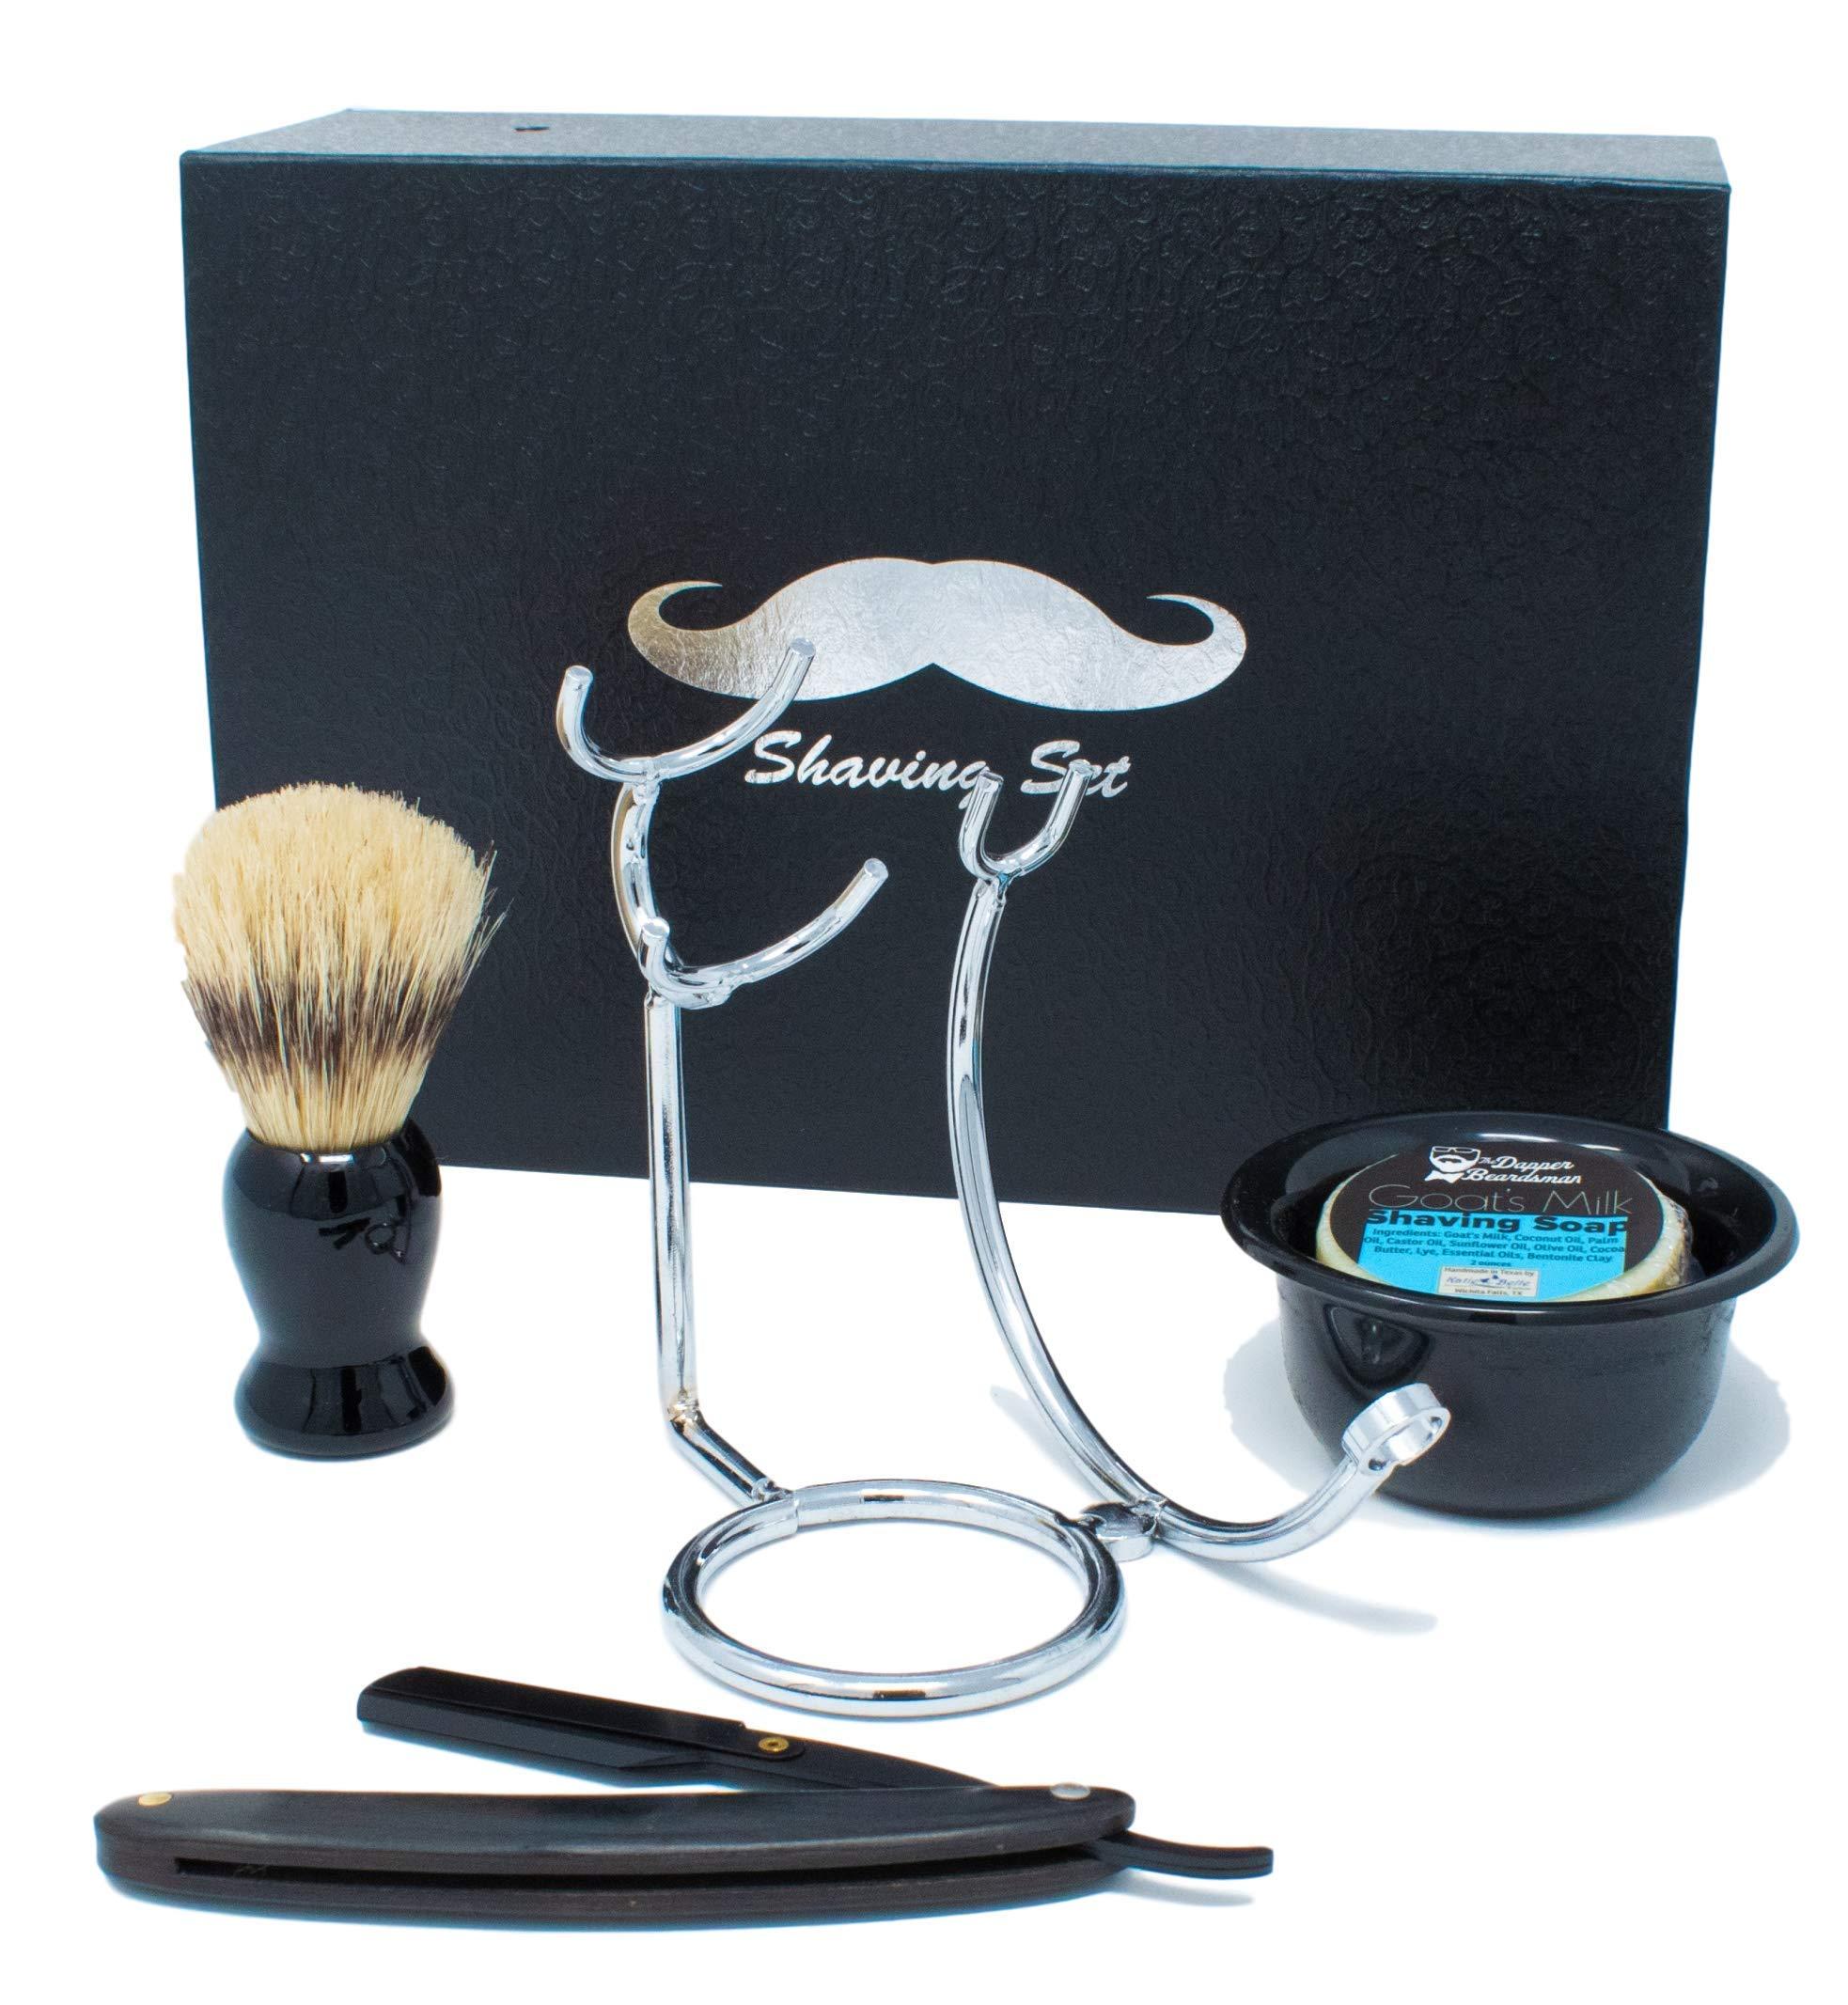 Vintage Style Straight Razor Shaving Set w/Shaving Soap by The Dapper Beardsman